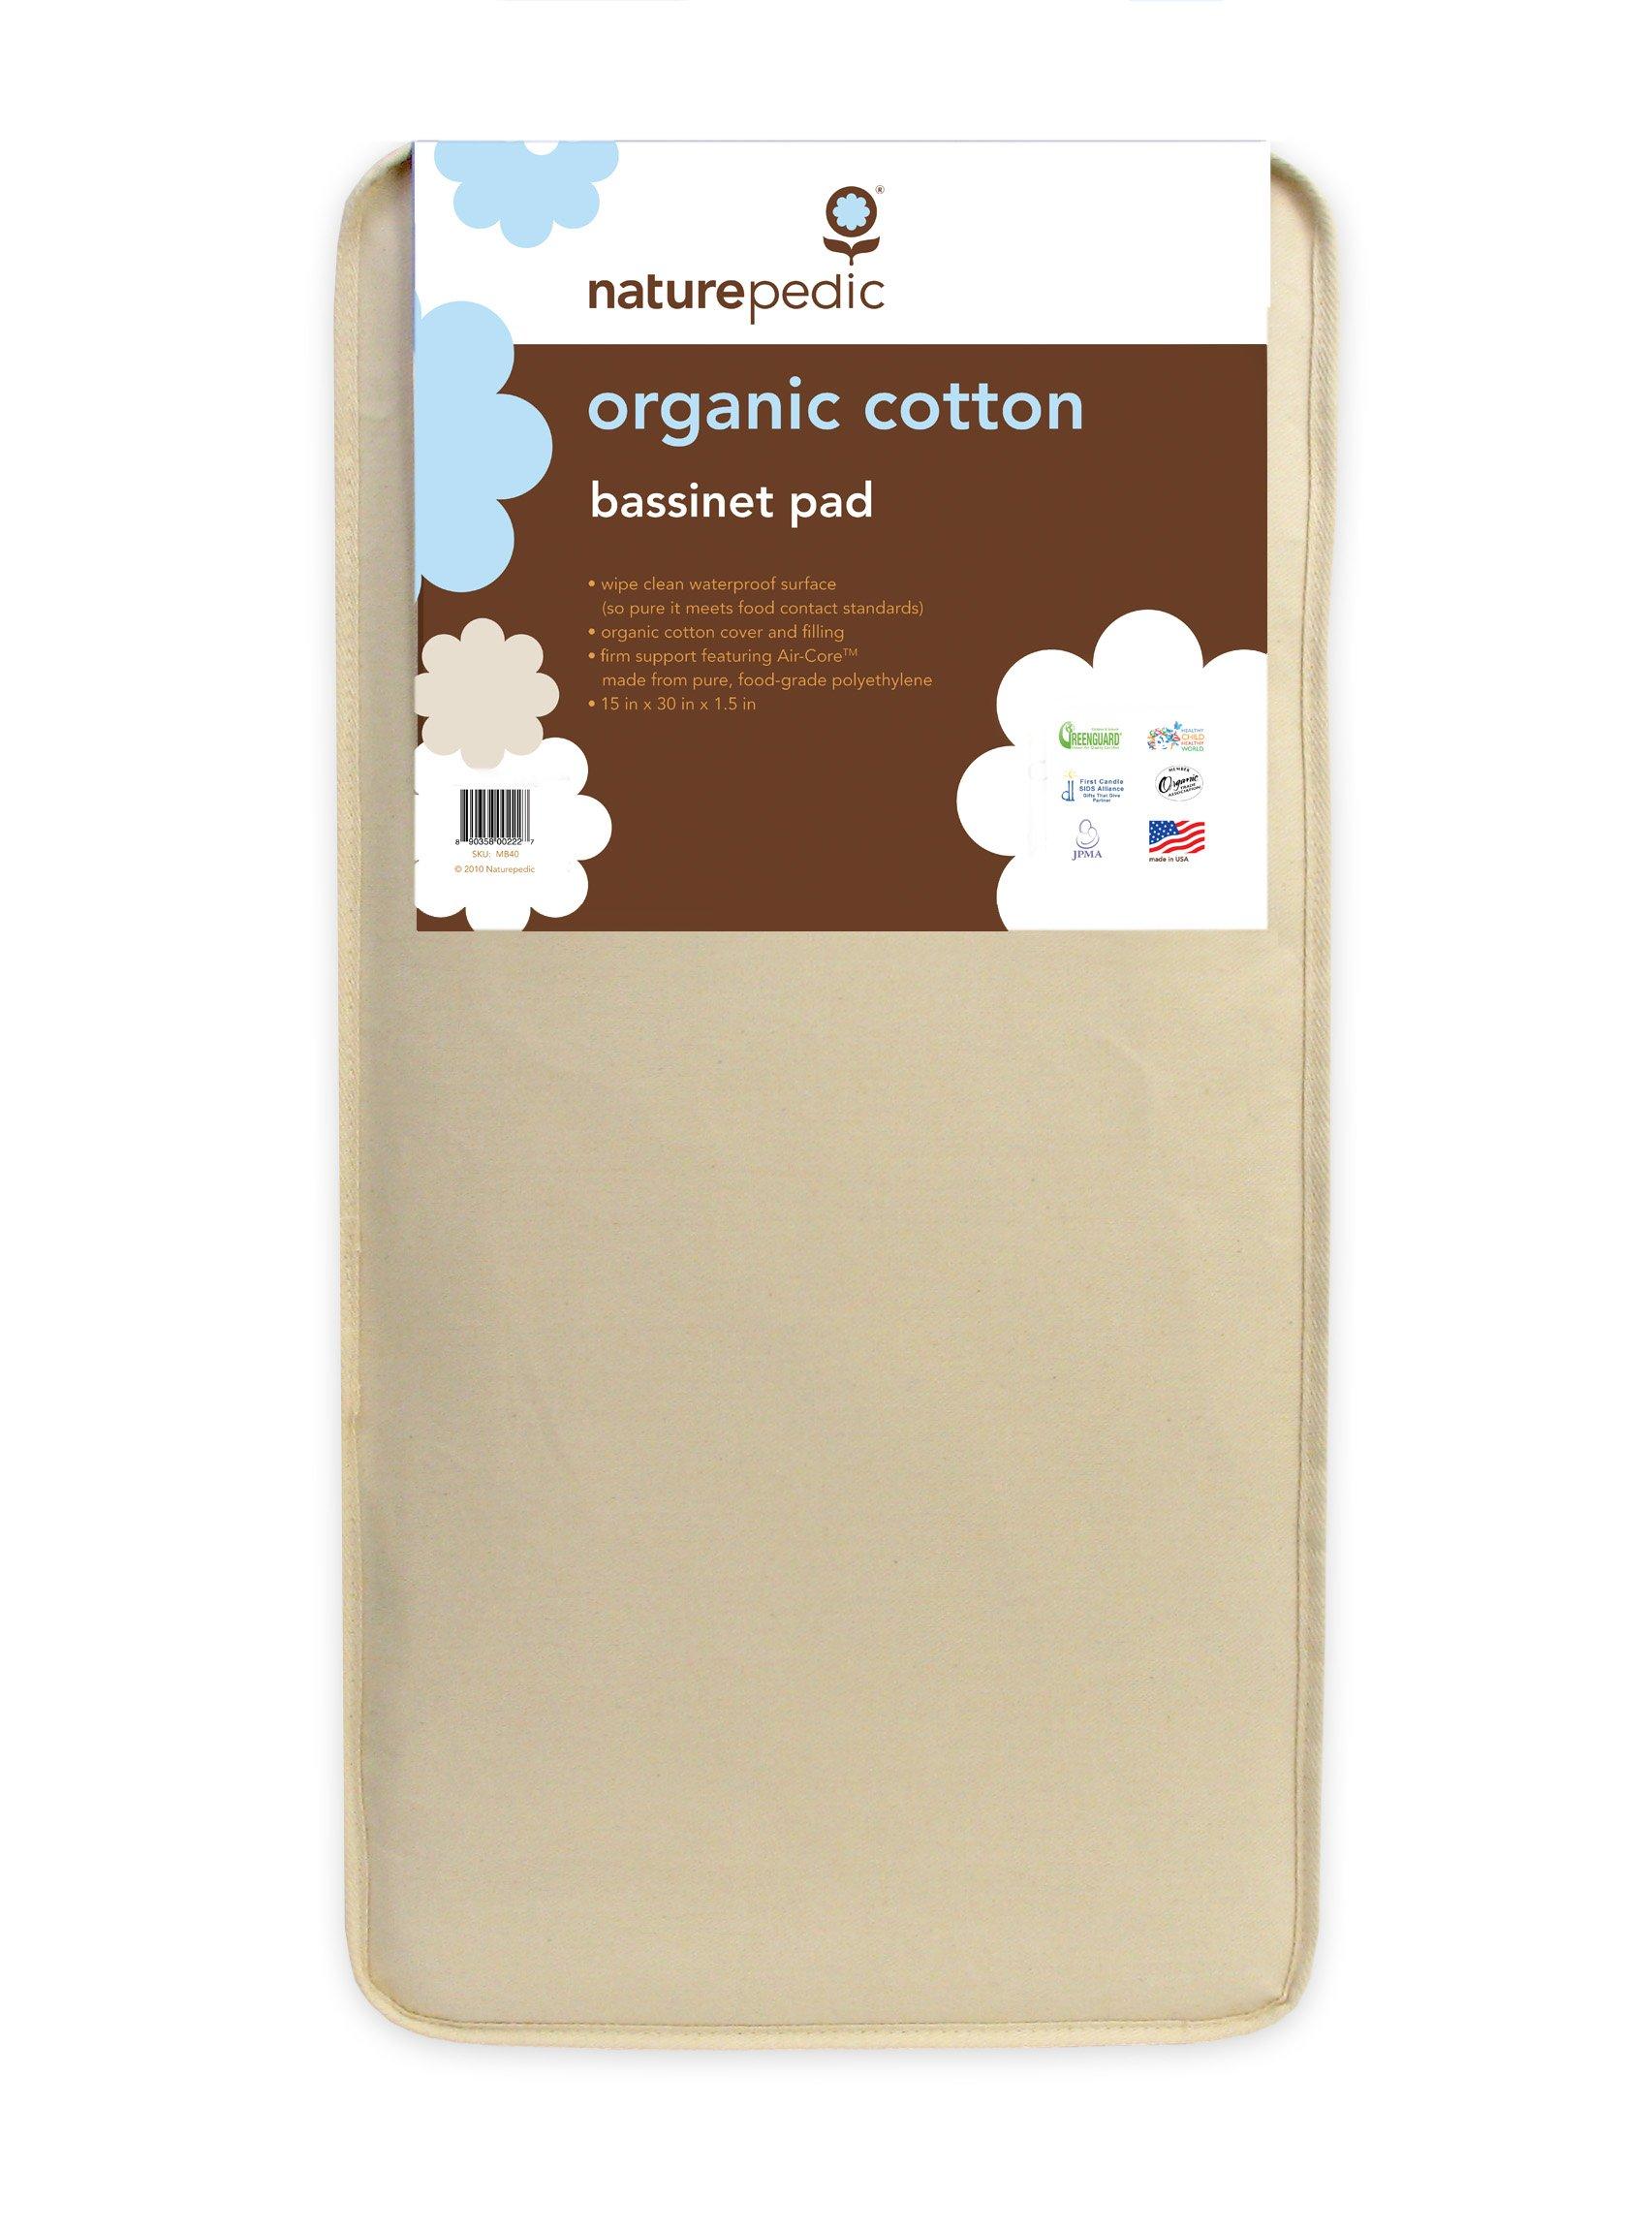 Naturepedic Organic Cotton Bassinet Pad (Rectangular 11''x29'')